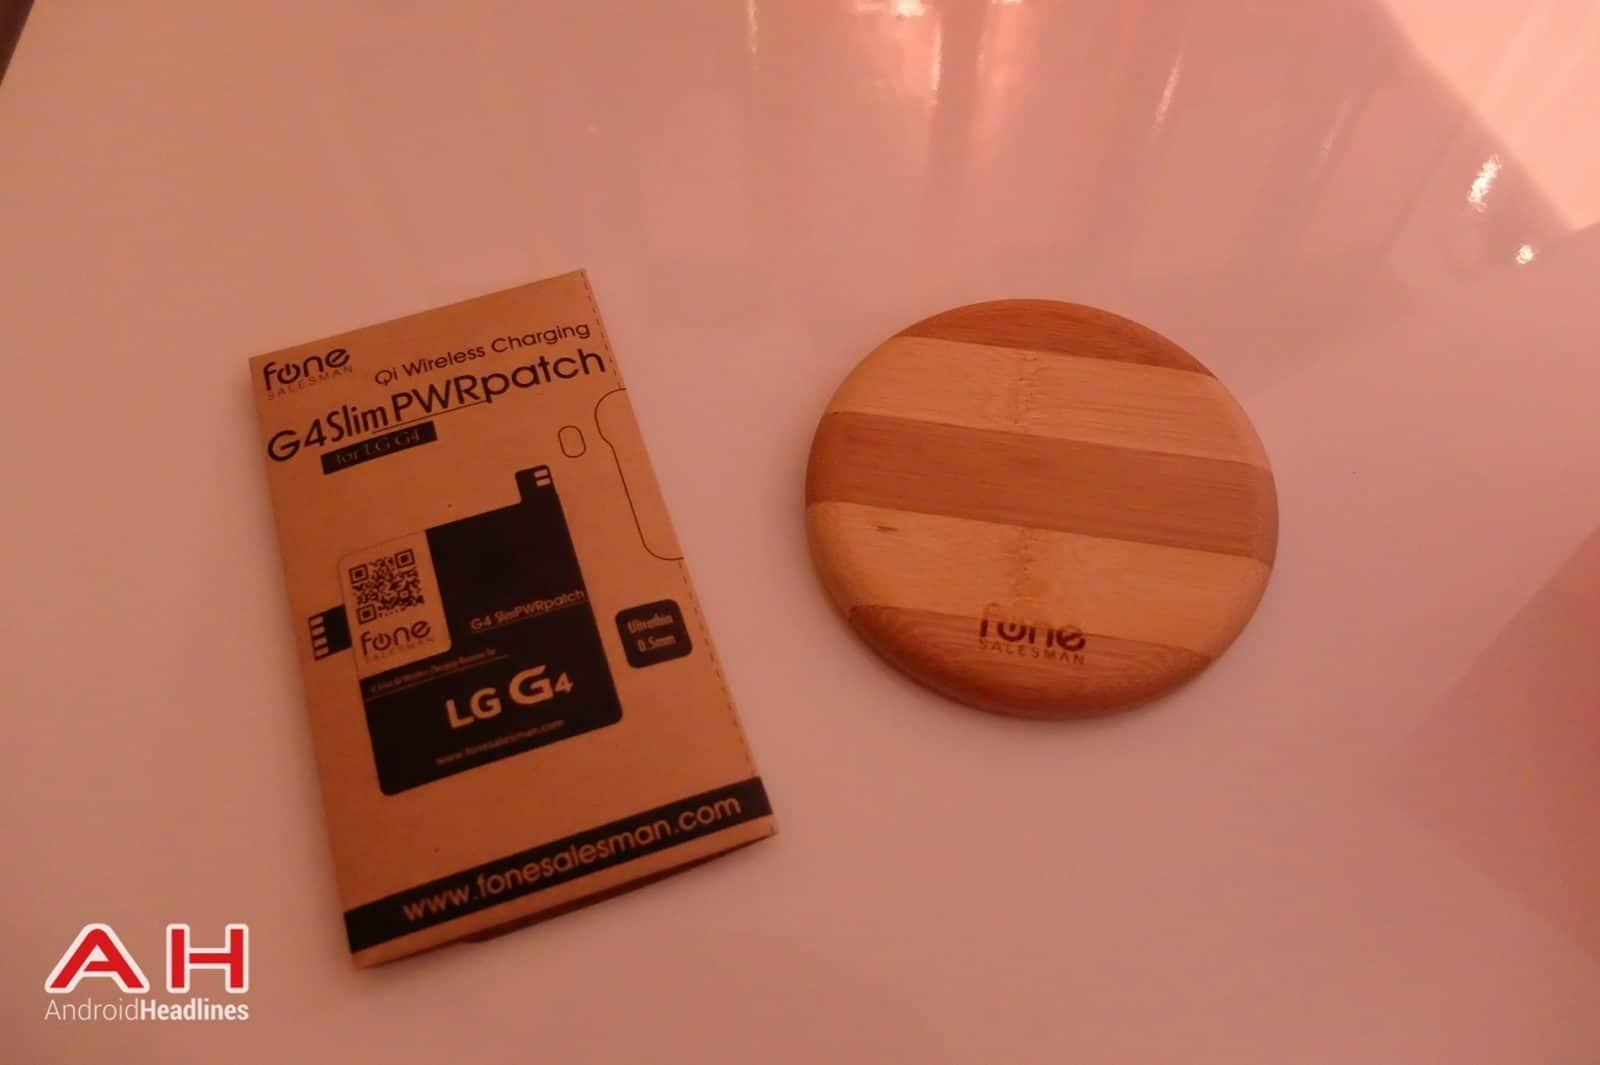 WoodPuck G4 Limited Edition AH 1